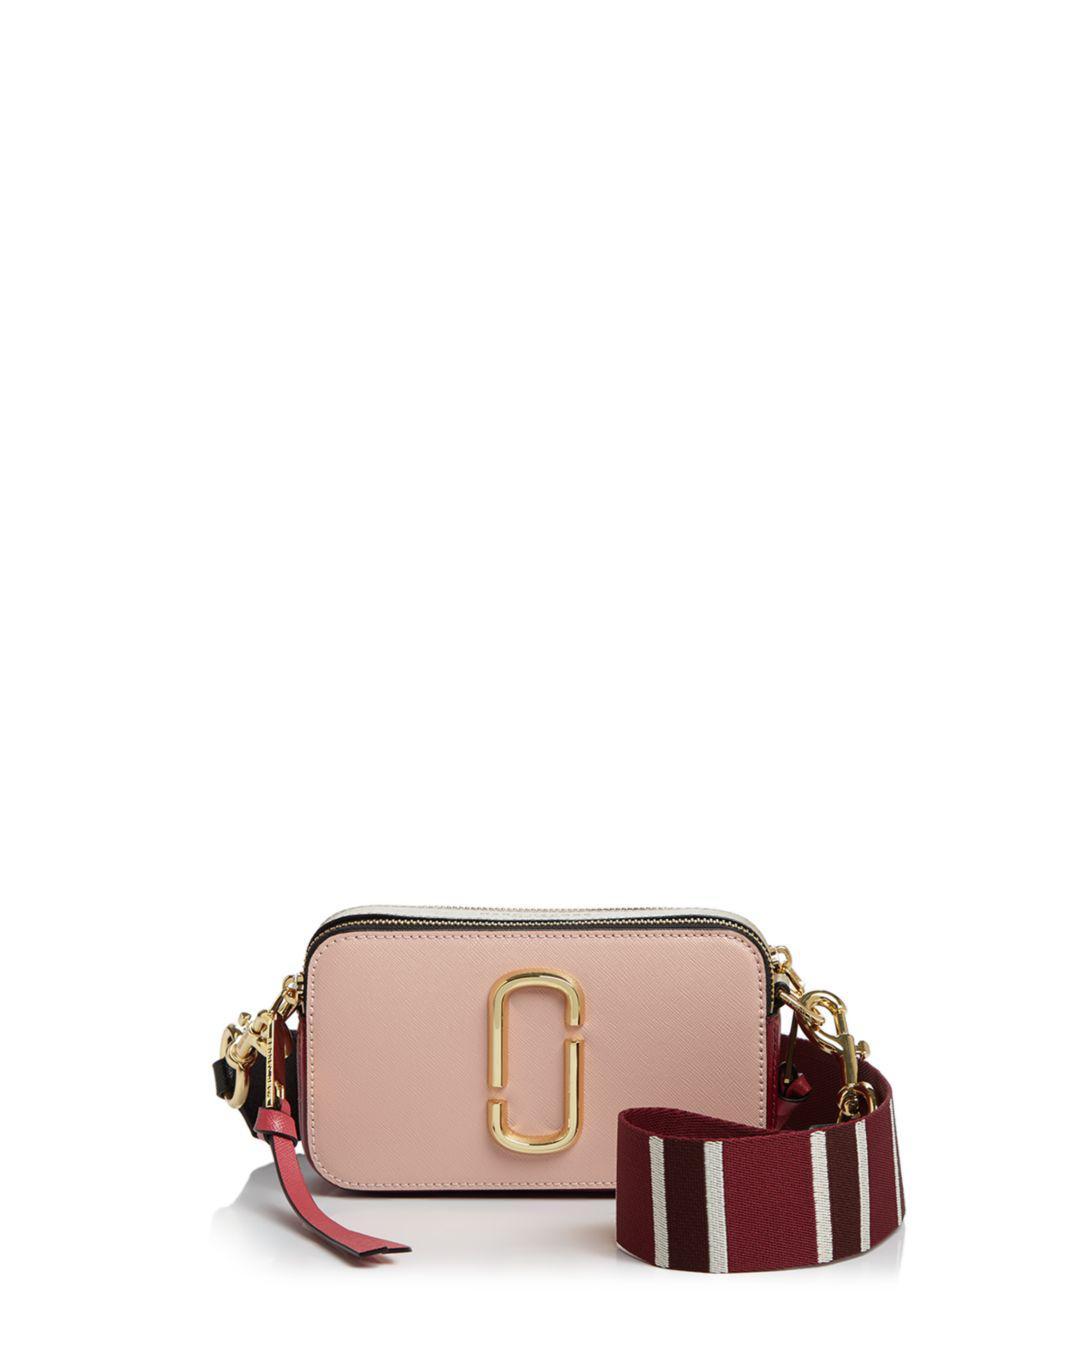 6053557ec7a Marc Jacobs Snapshot Color Block Saffiano Leather Camera Bag - Save ...